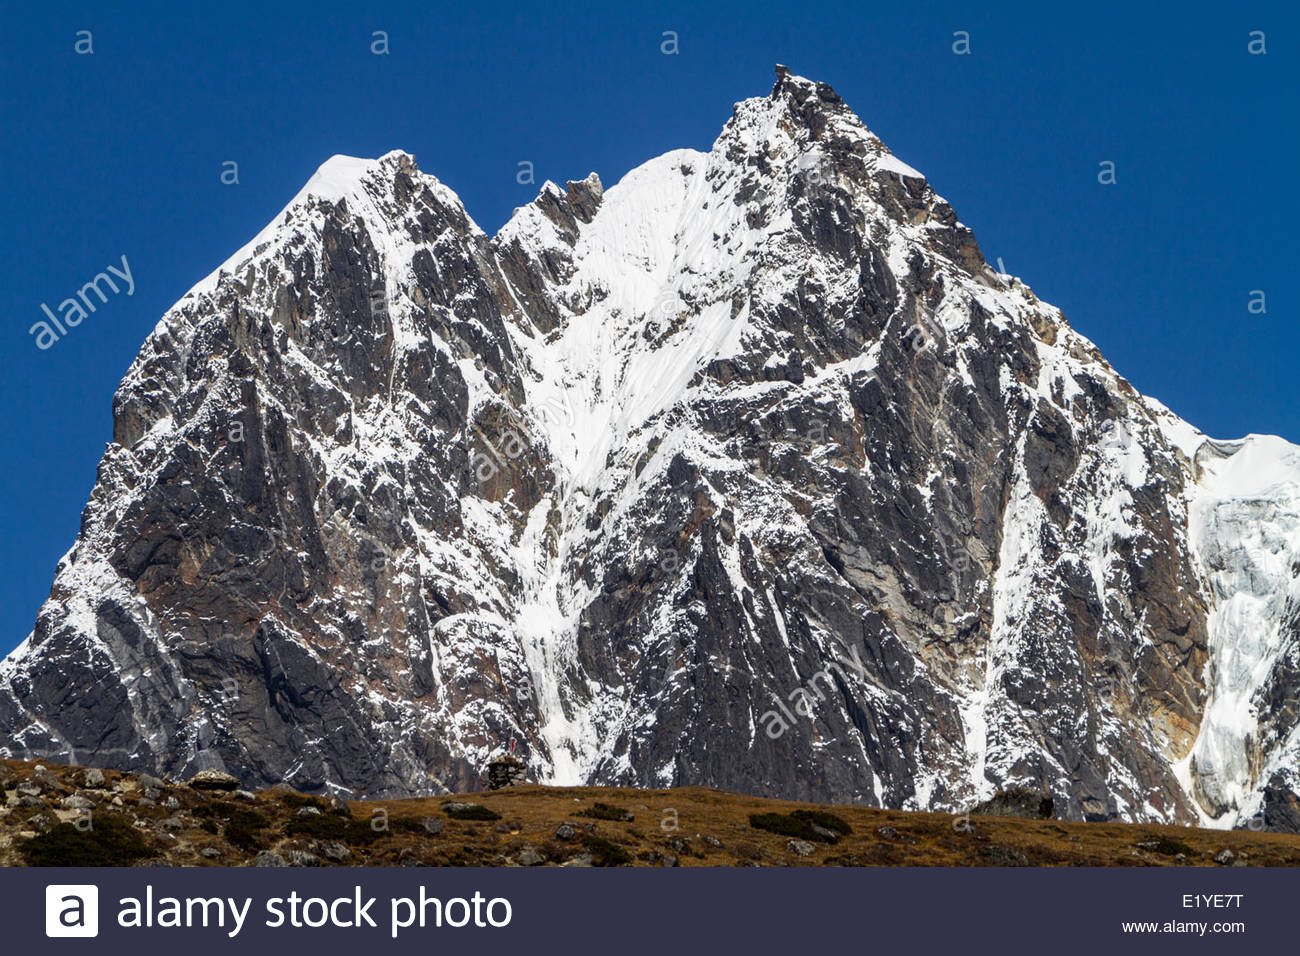 Stupa commémoratif et pic de l'Himalaya, Népal Photo Stock